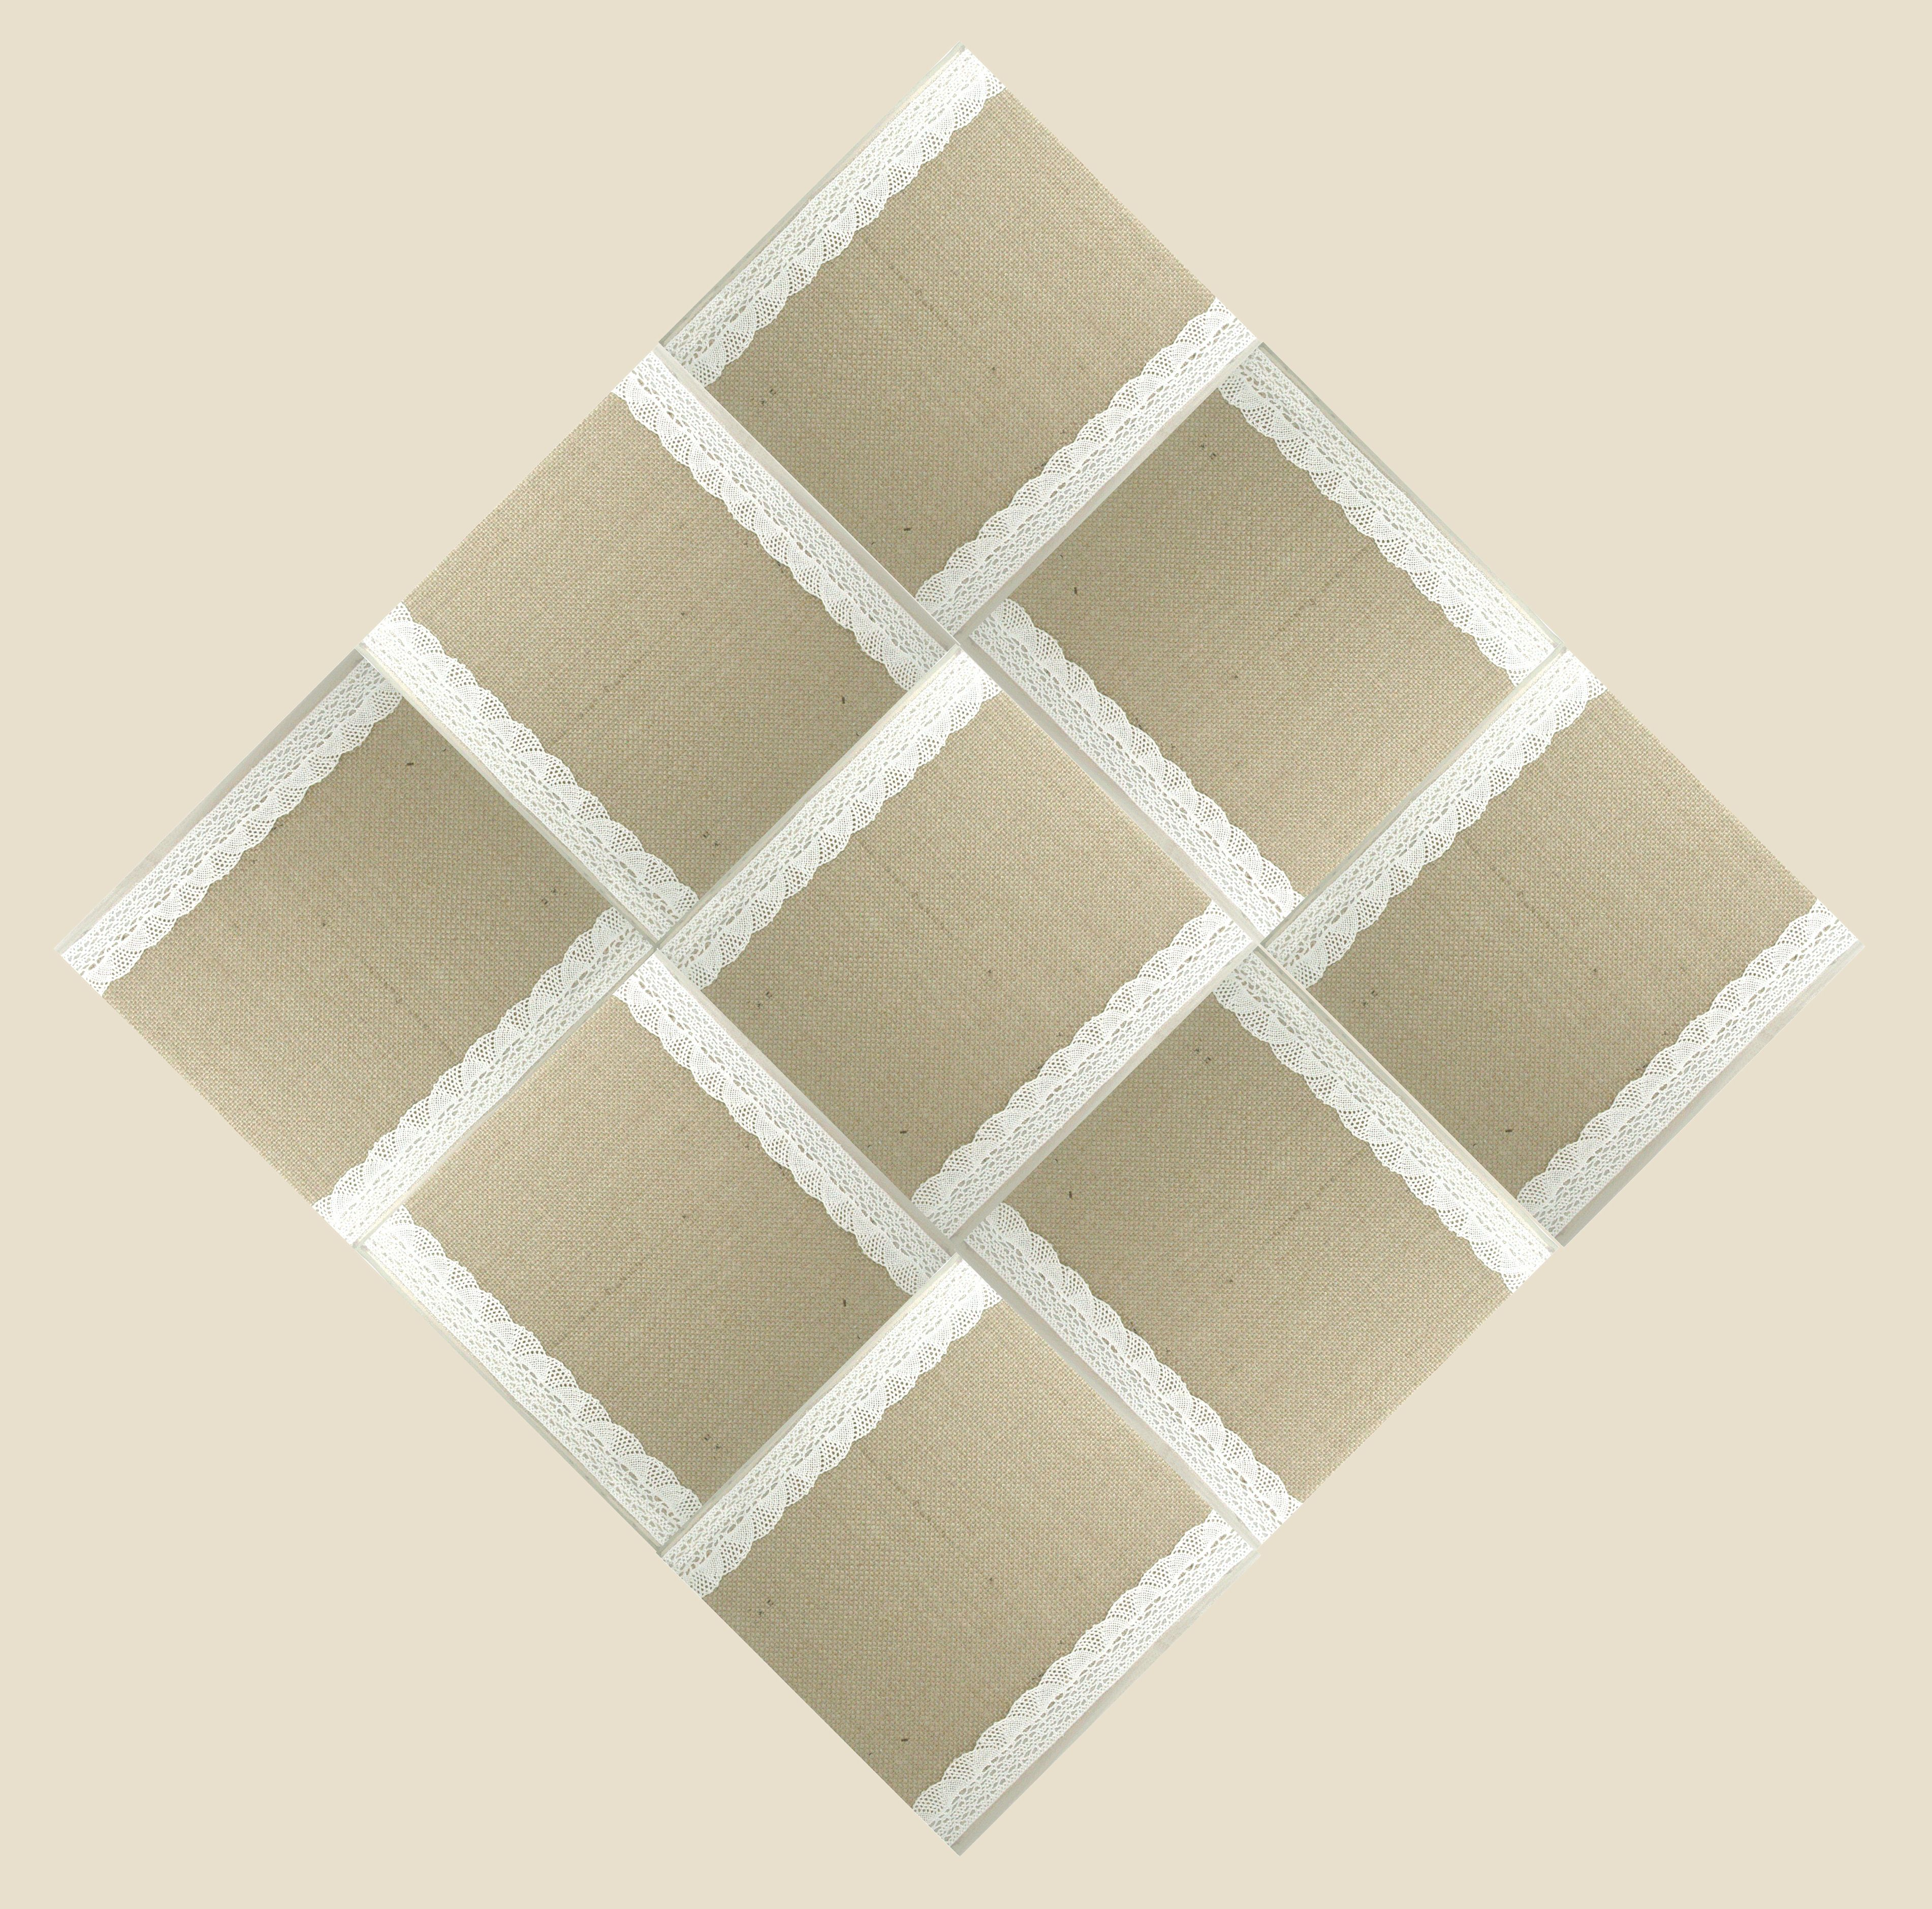 Interior Tiles Leather / Textiles. Size of single tile 20x20. Size ...